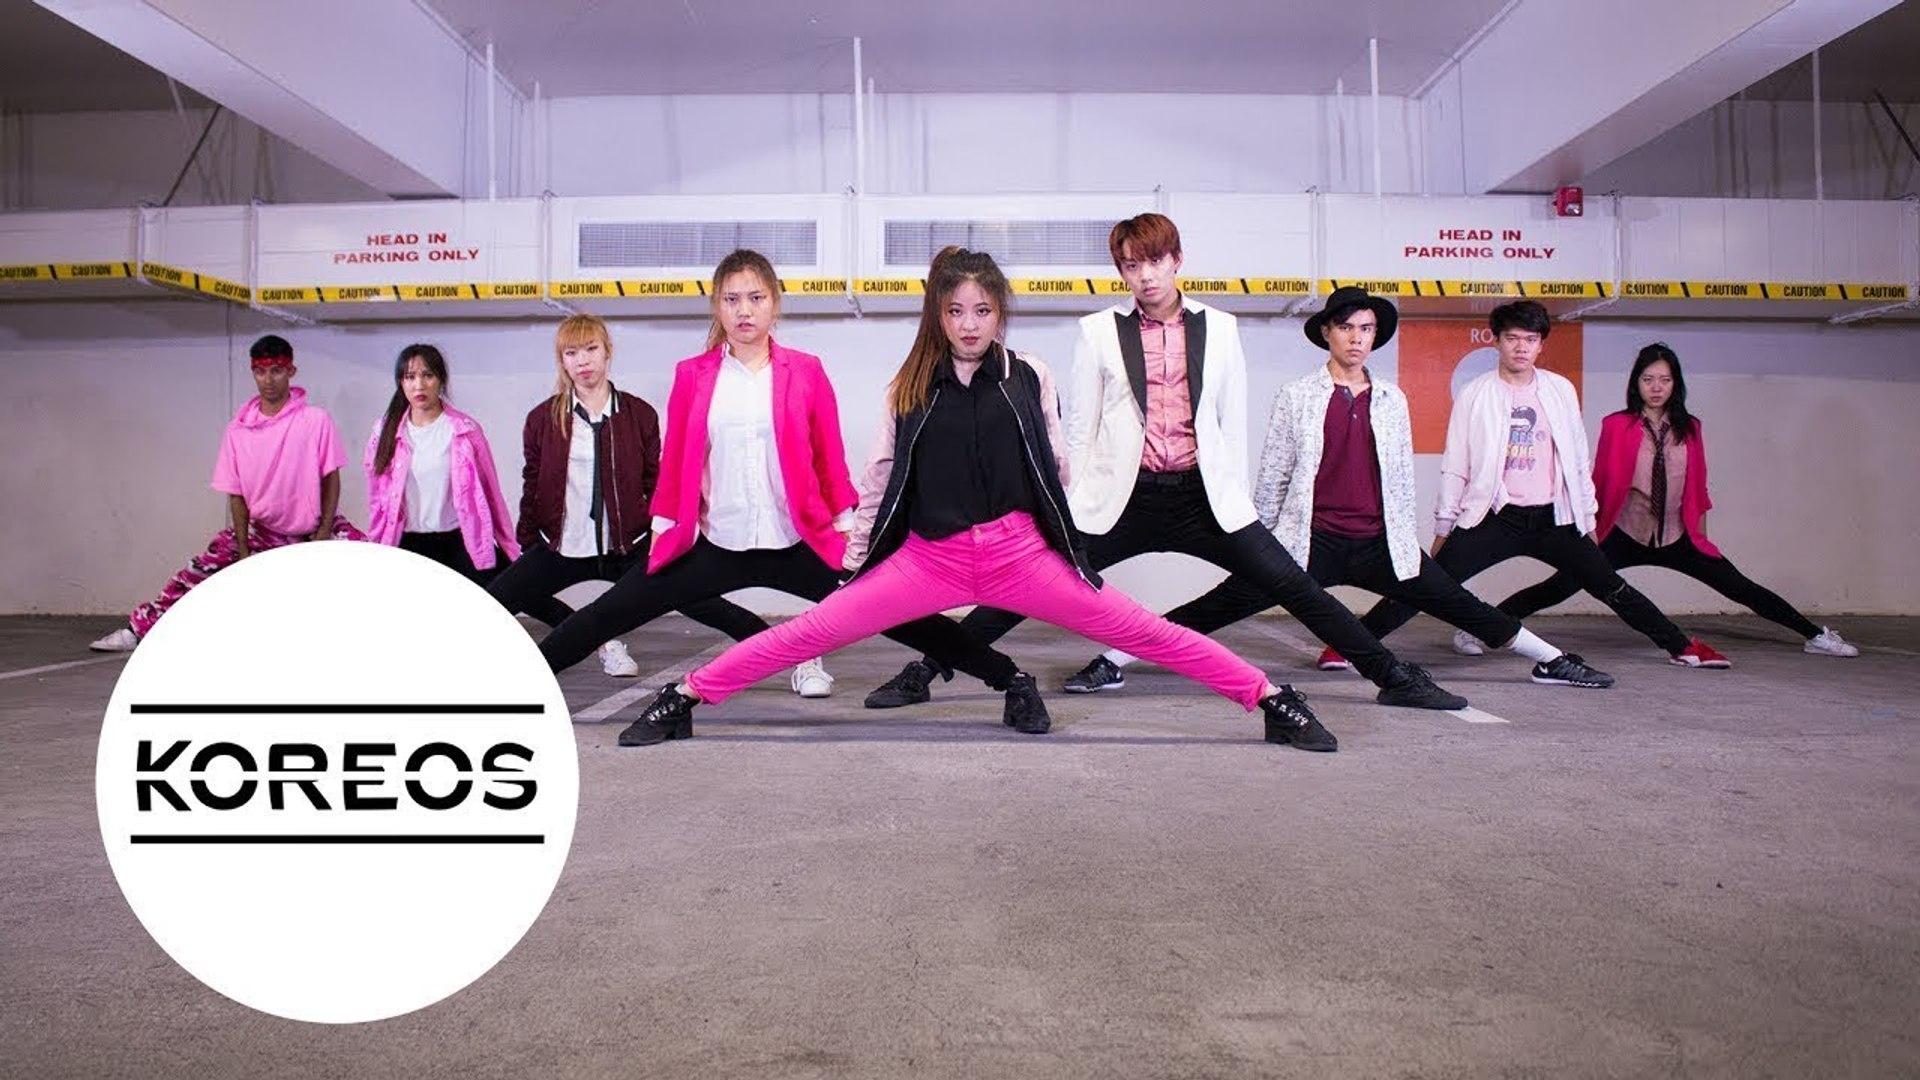 [Koreos] NCT 127 엔시티 127 - Cherry Bomb 체리 밤 Dance Cover 댄스커버